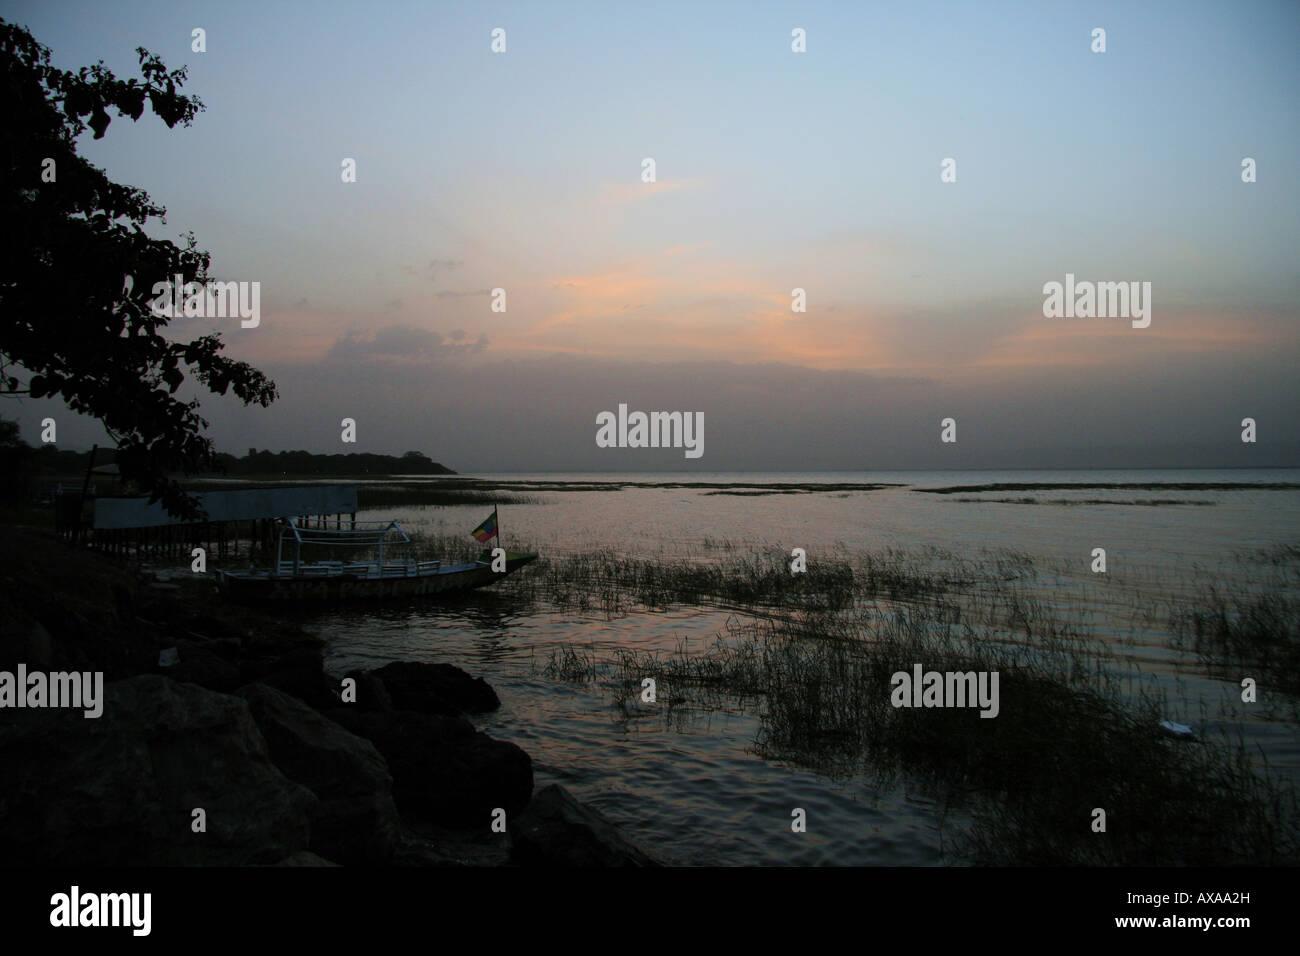 Lake Awasa, southern Ethiopia - Stock Image